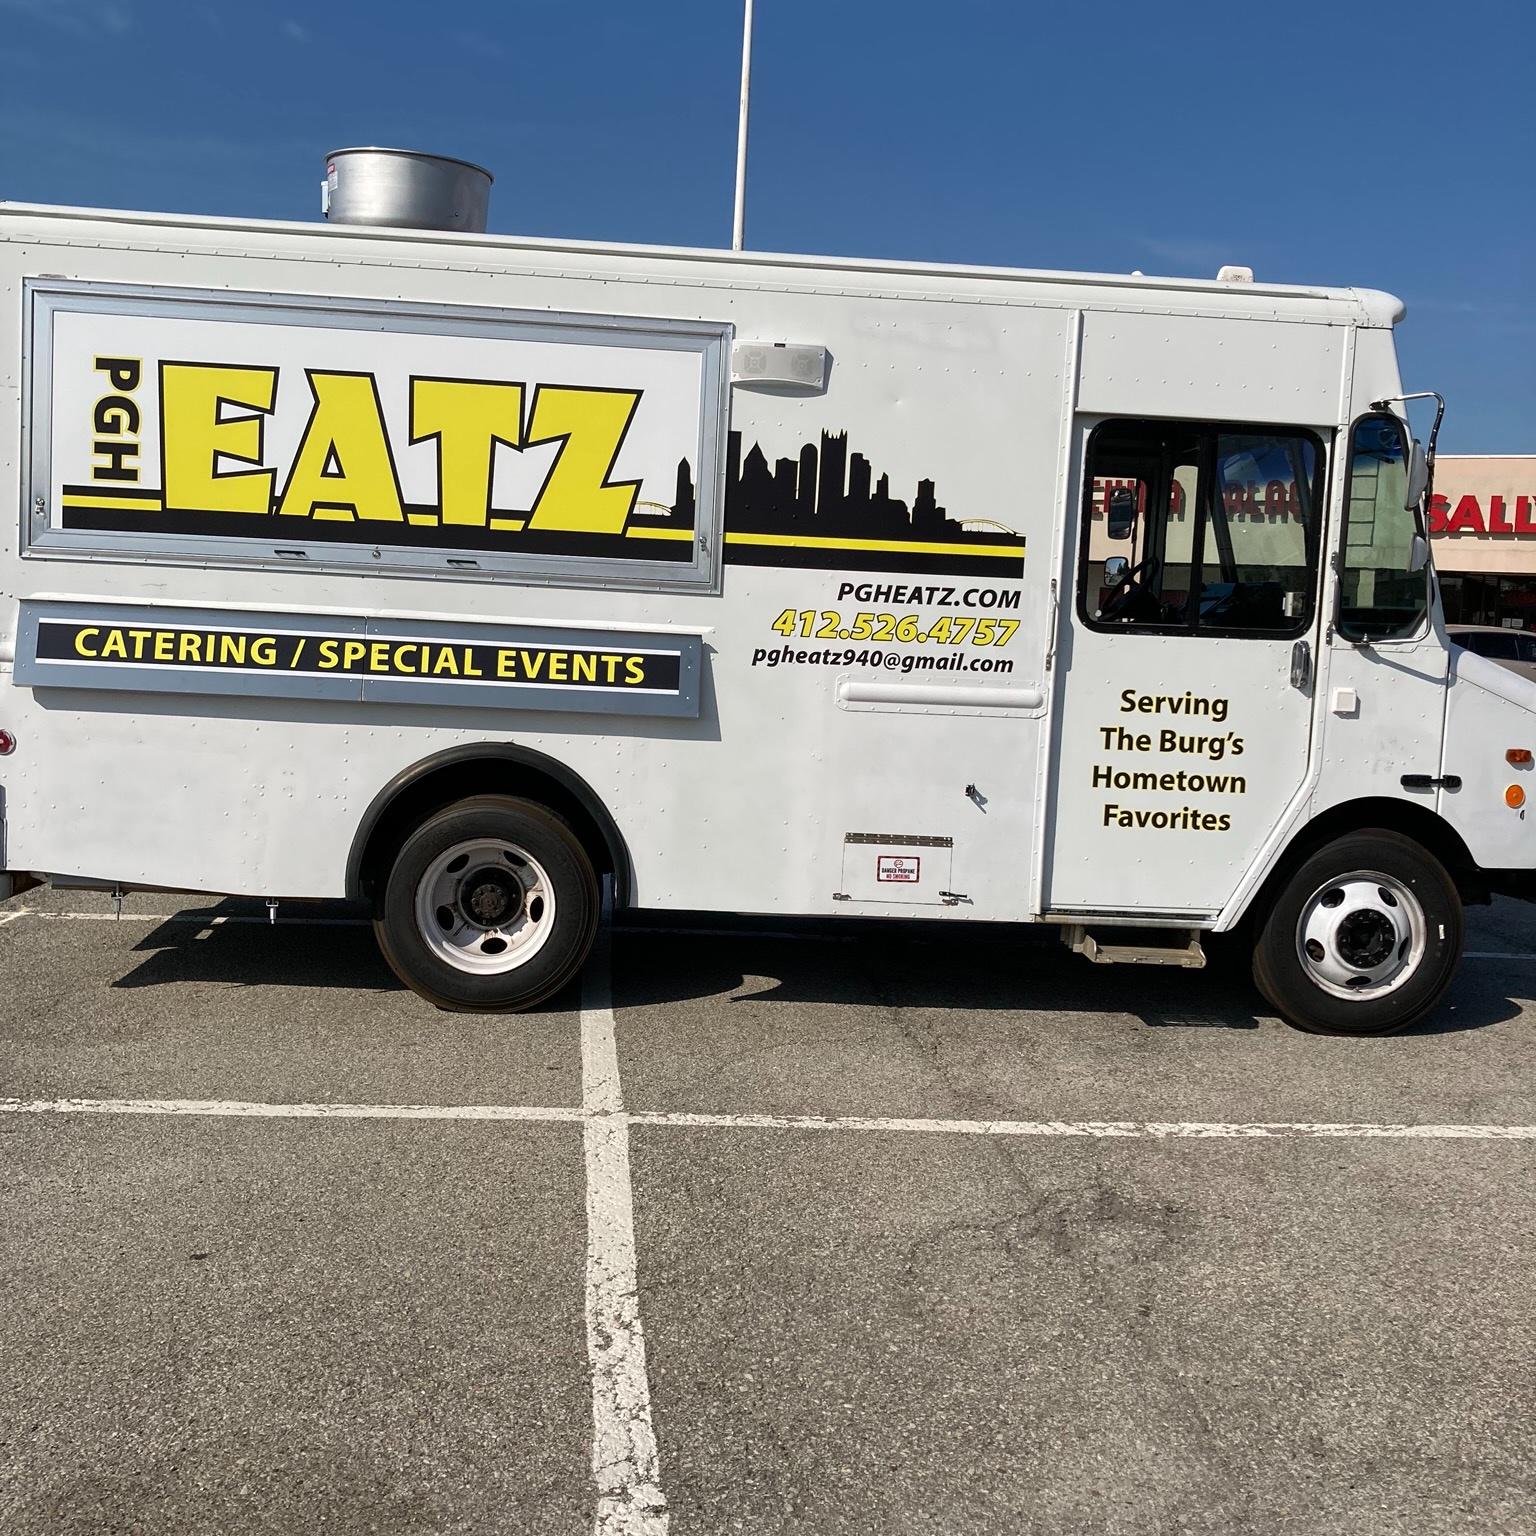 PGH EATZ food truck profile image